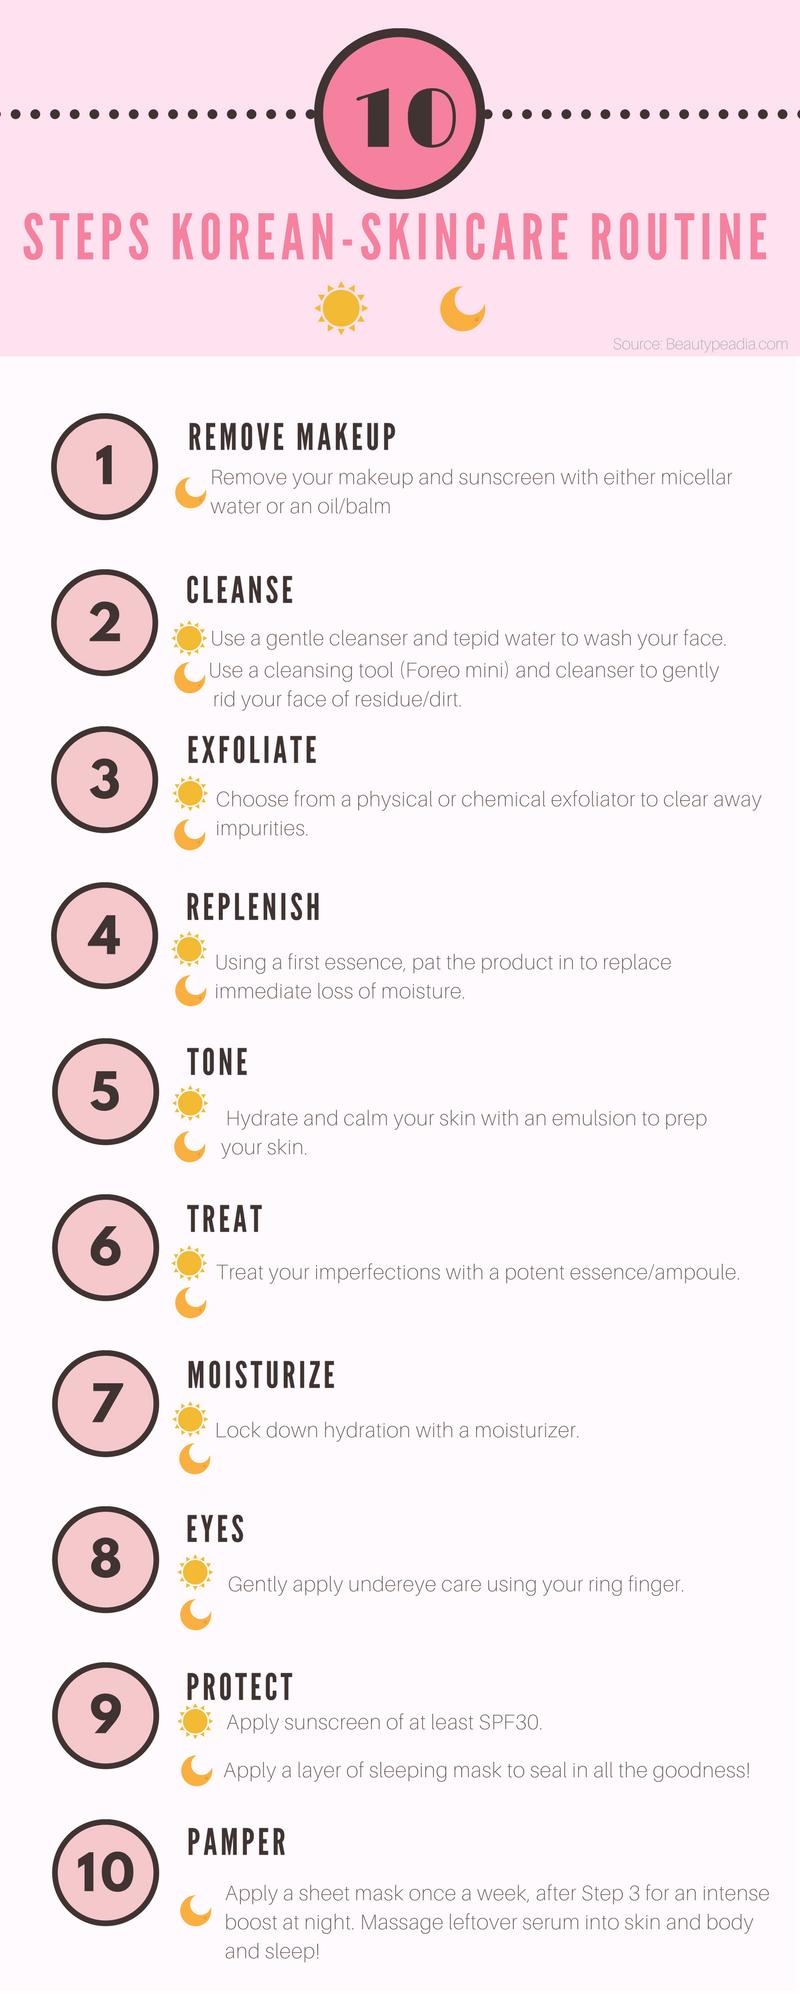 I Tried The 10 Steps Korean Skincare Routine Beautypeadia